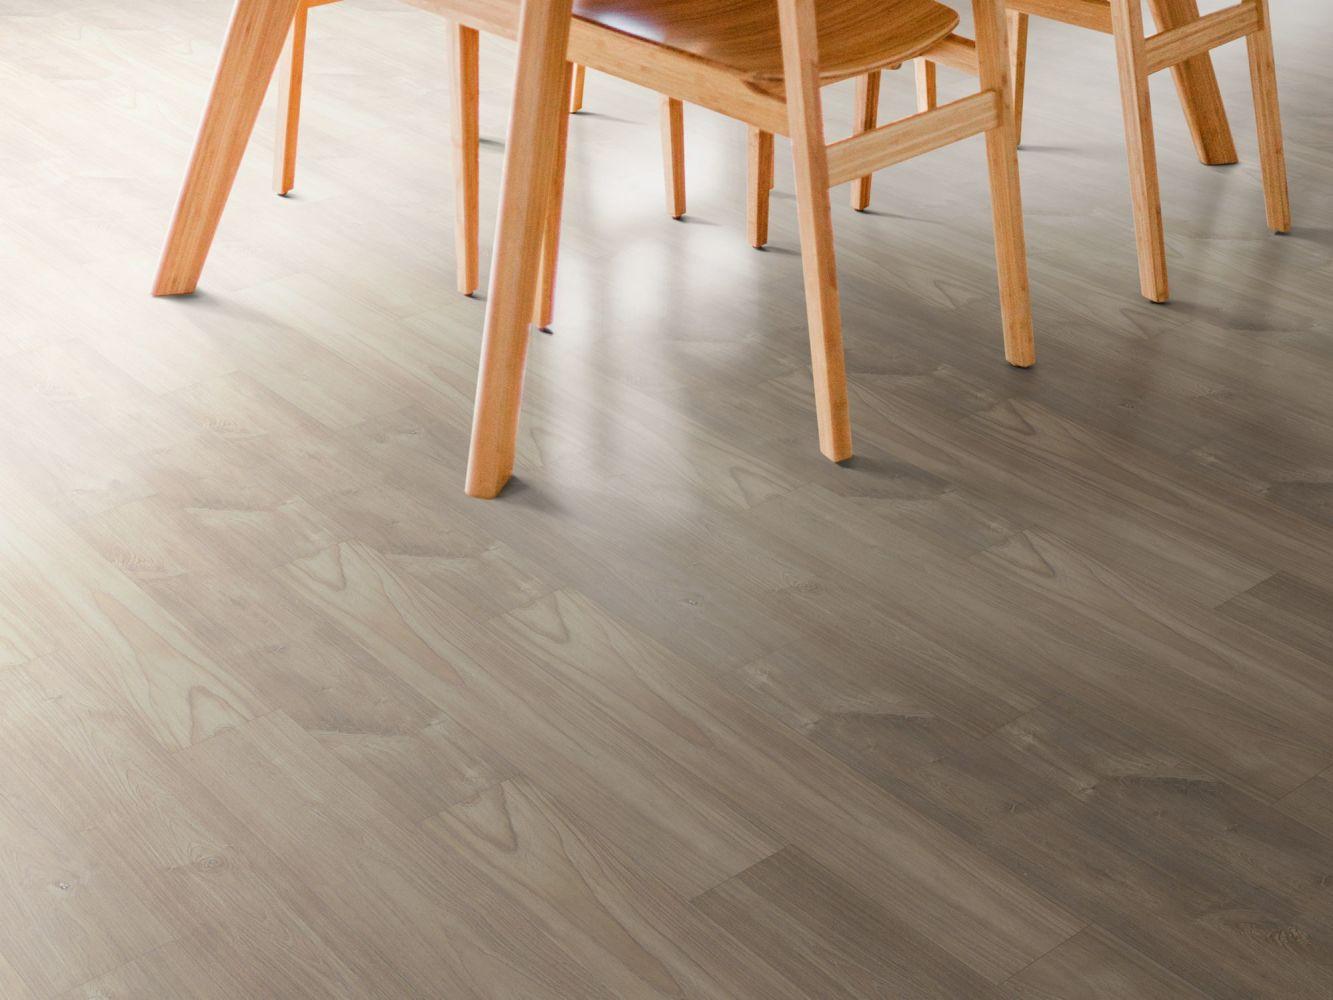 Shaw Floors Versalock Laminate Intrigue Chiseled Oak 07723_SL448